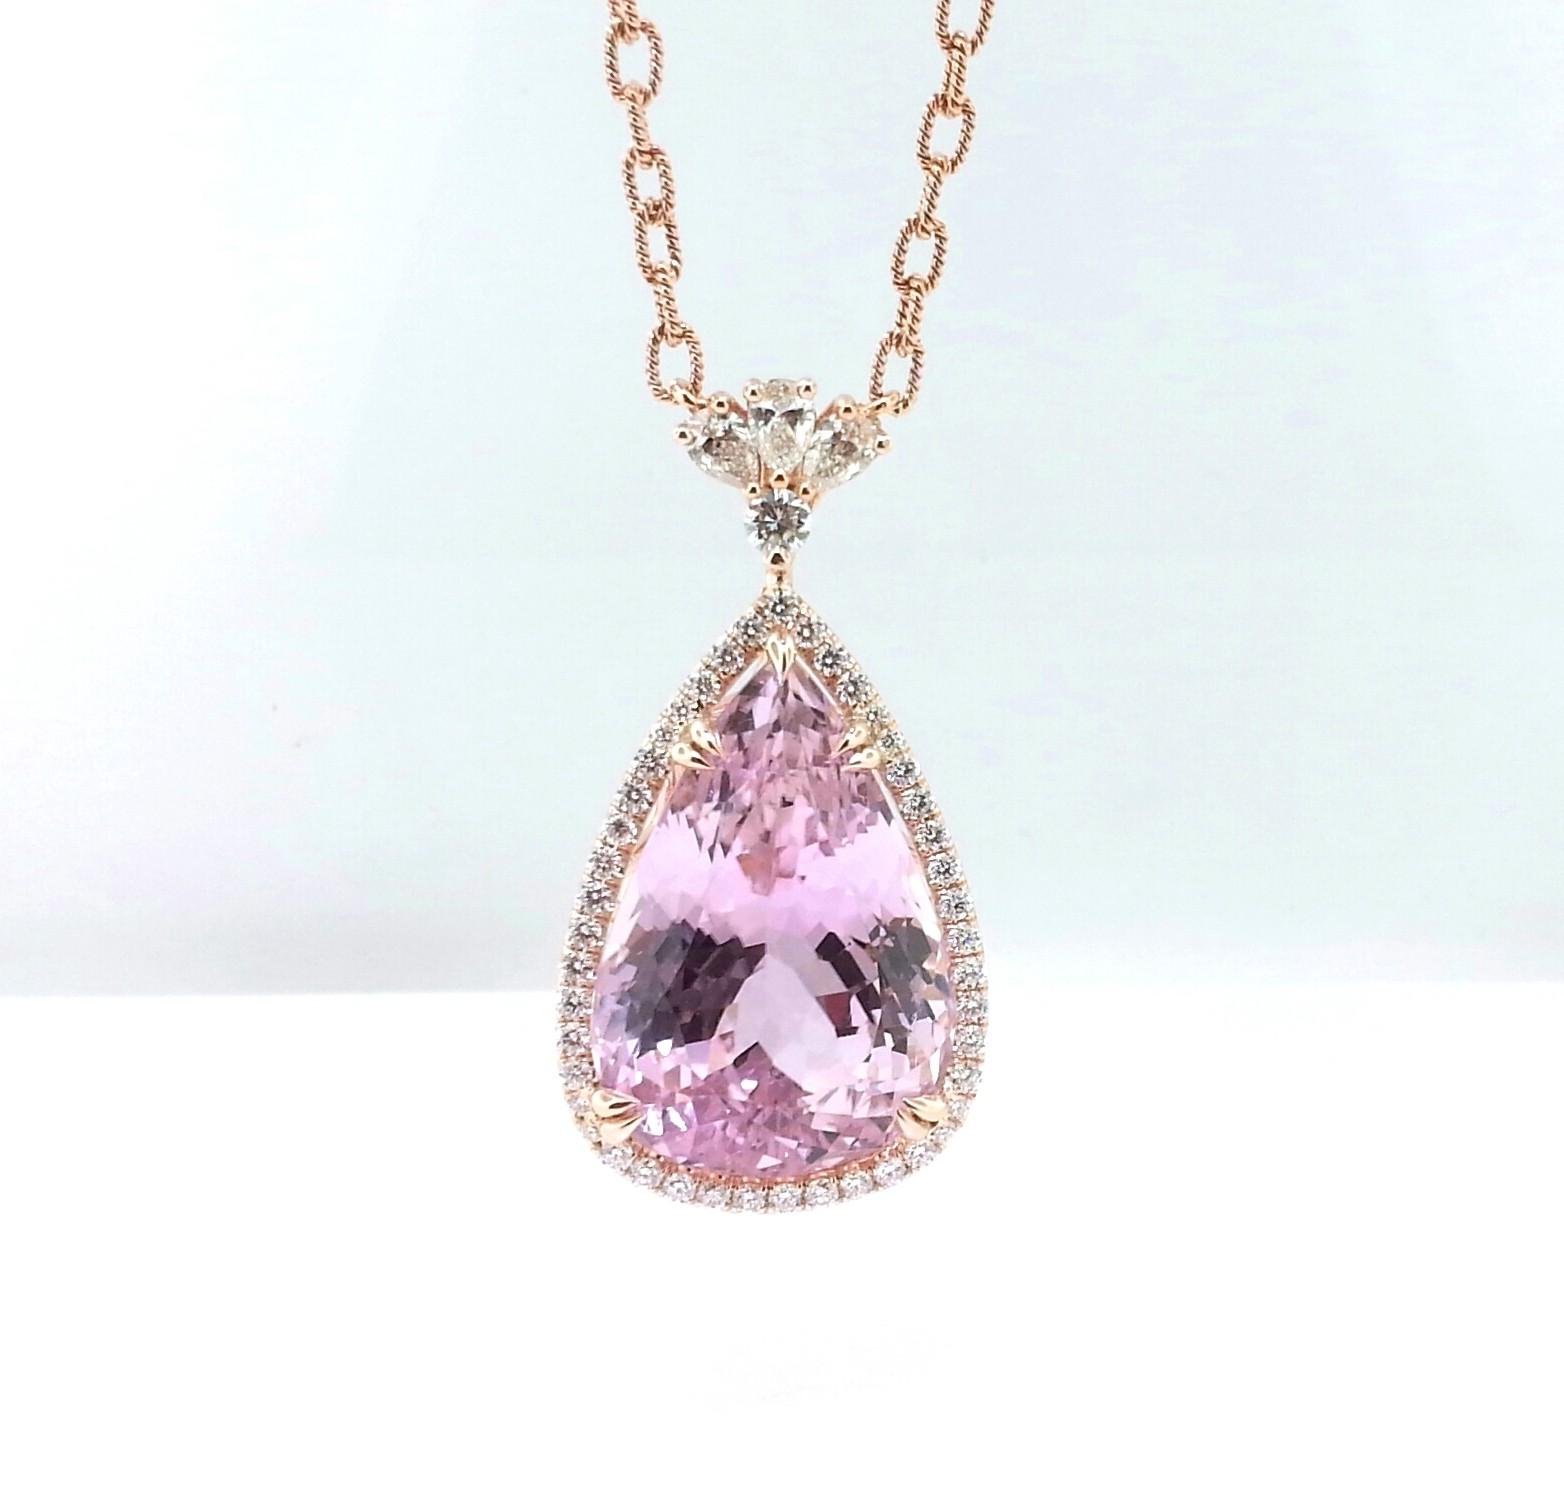 18 Karat Rose Gold Diamond and Kunzite Necklace.